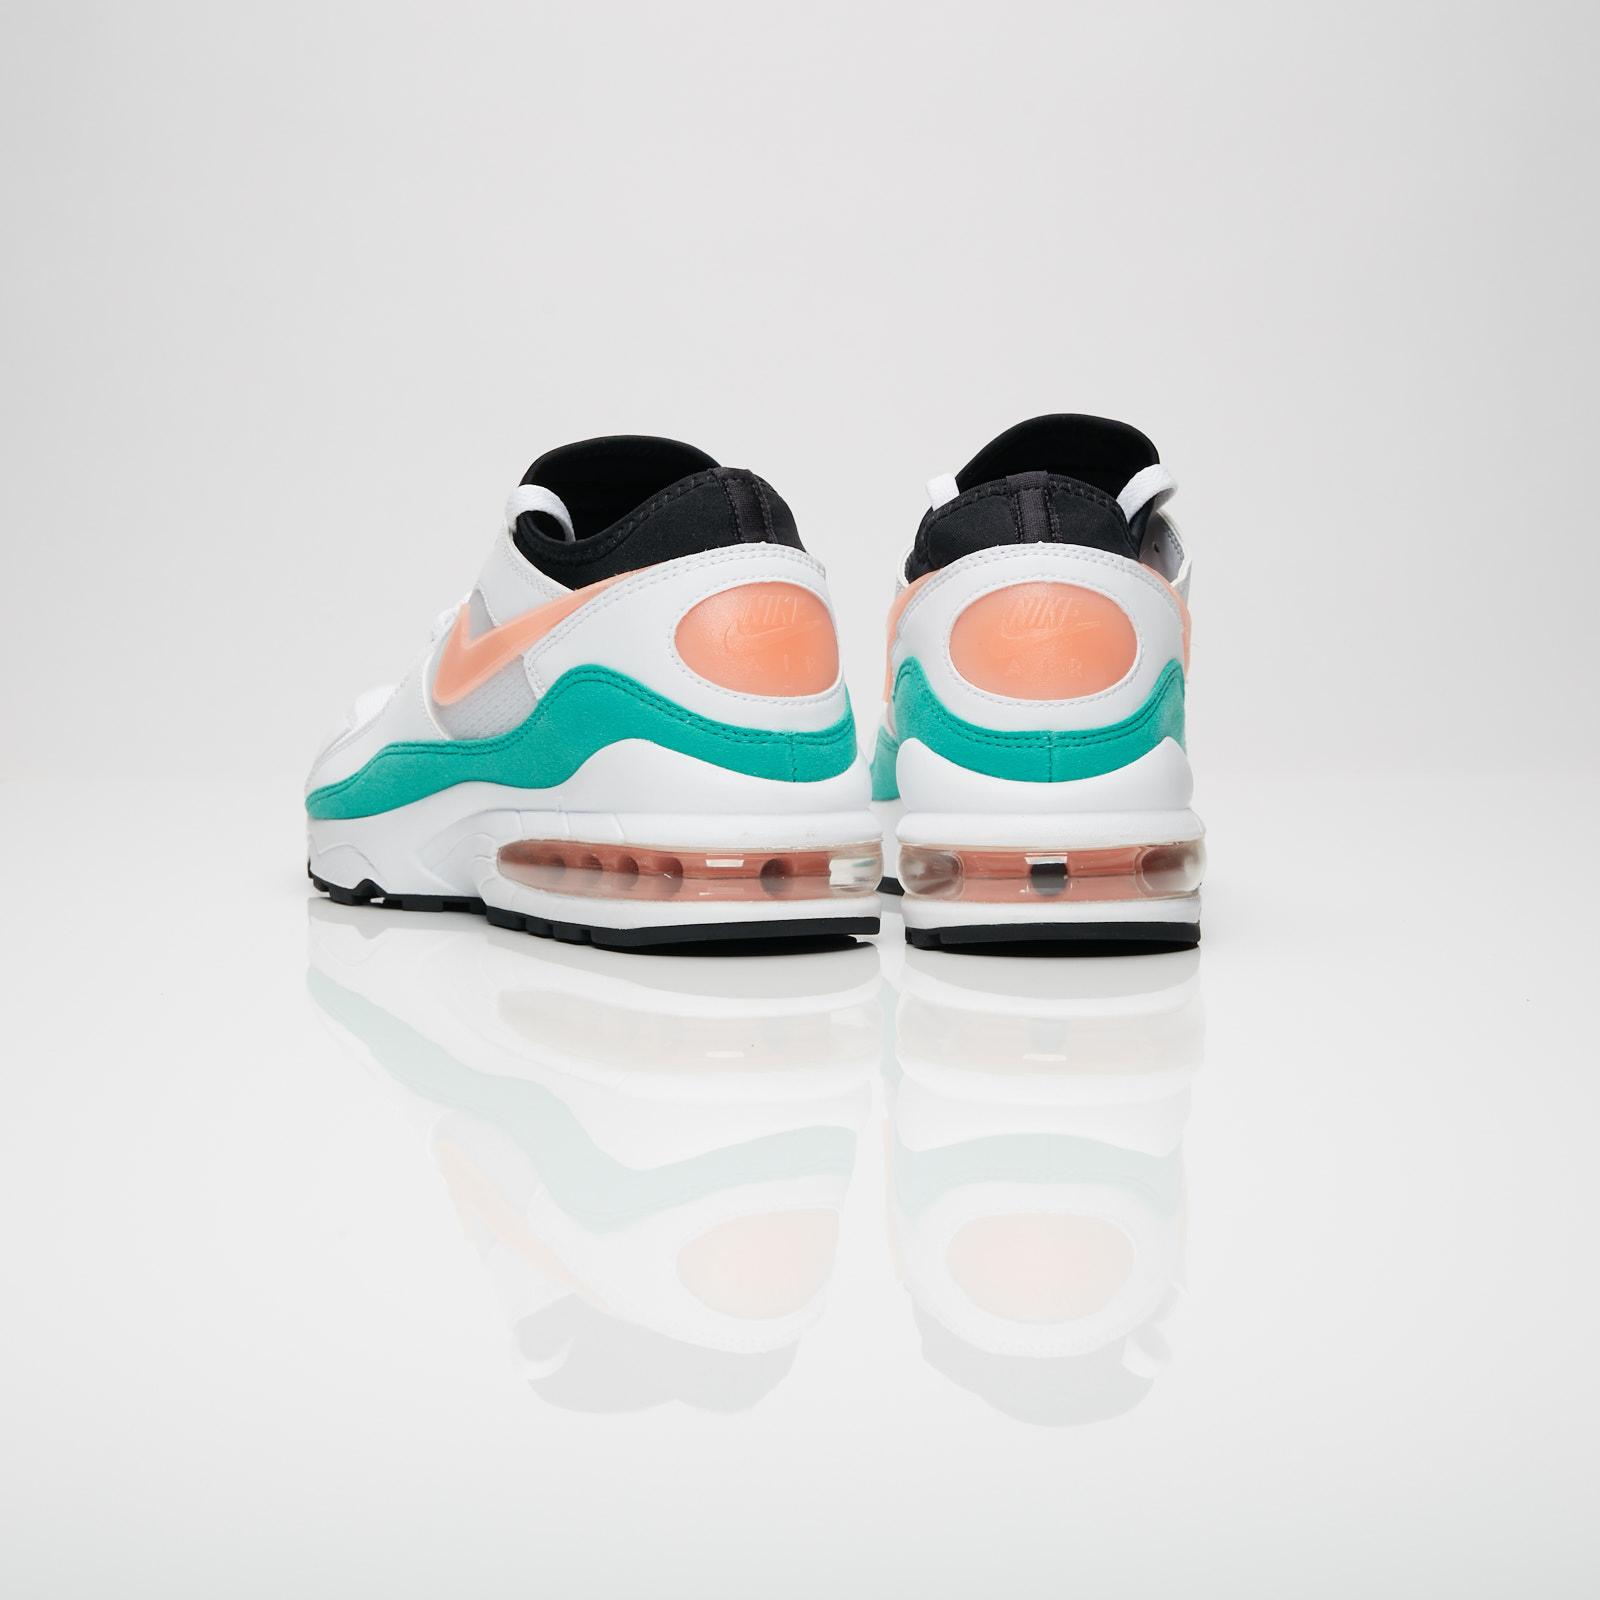 8ff88005e0 Nike Air Max 93 - 306551-105 - Sneakersnstuff | sneakers & streetwear  online since 1999